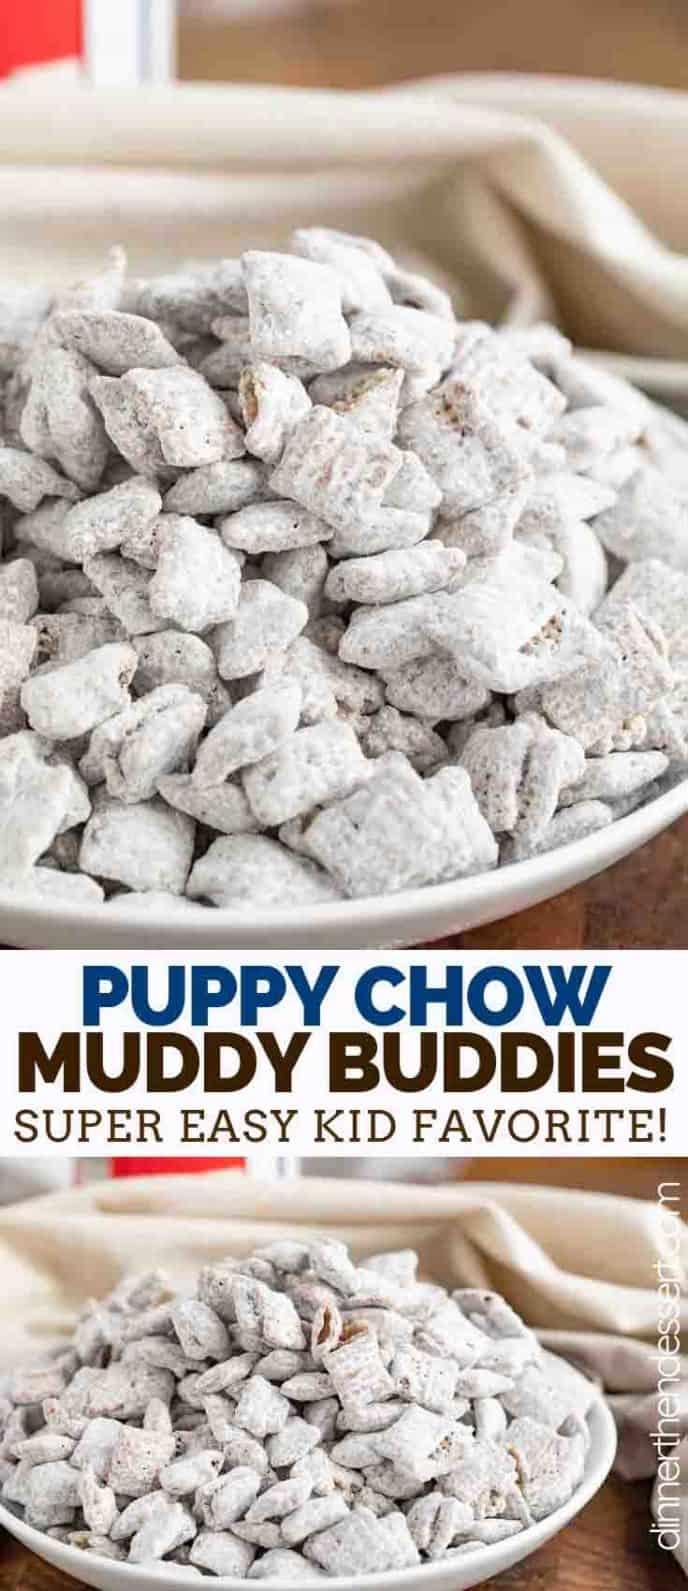 Puppy Chow (Muddy Buddies)